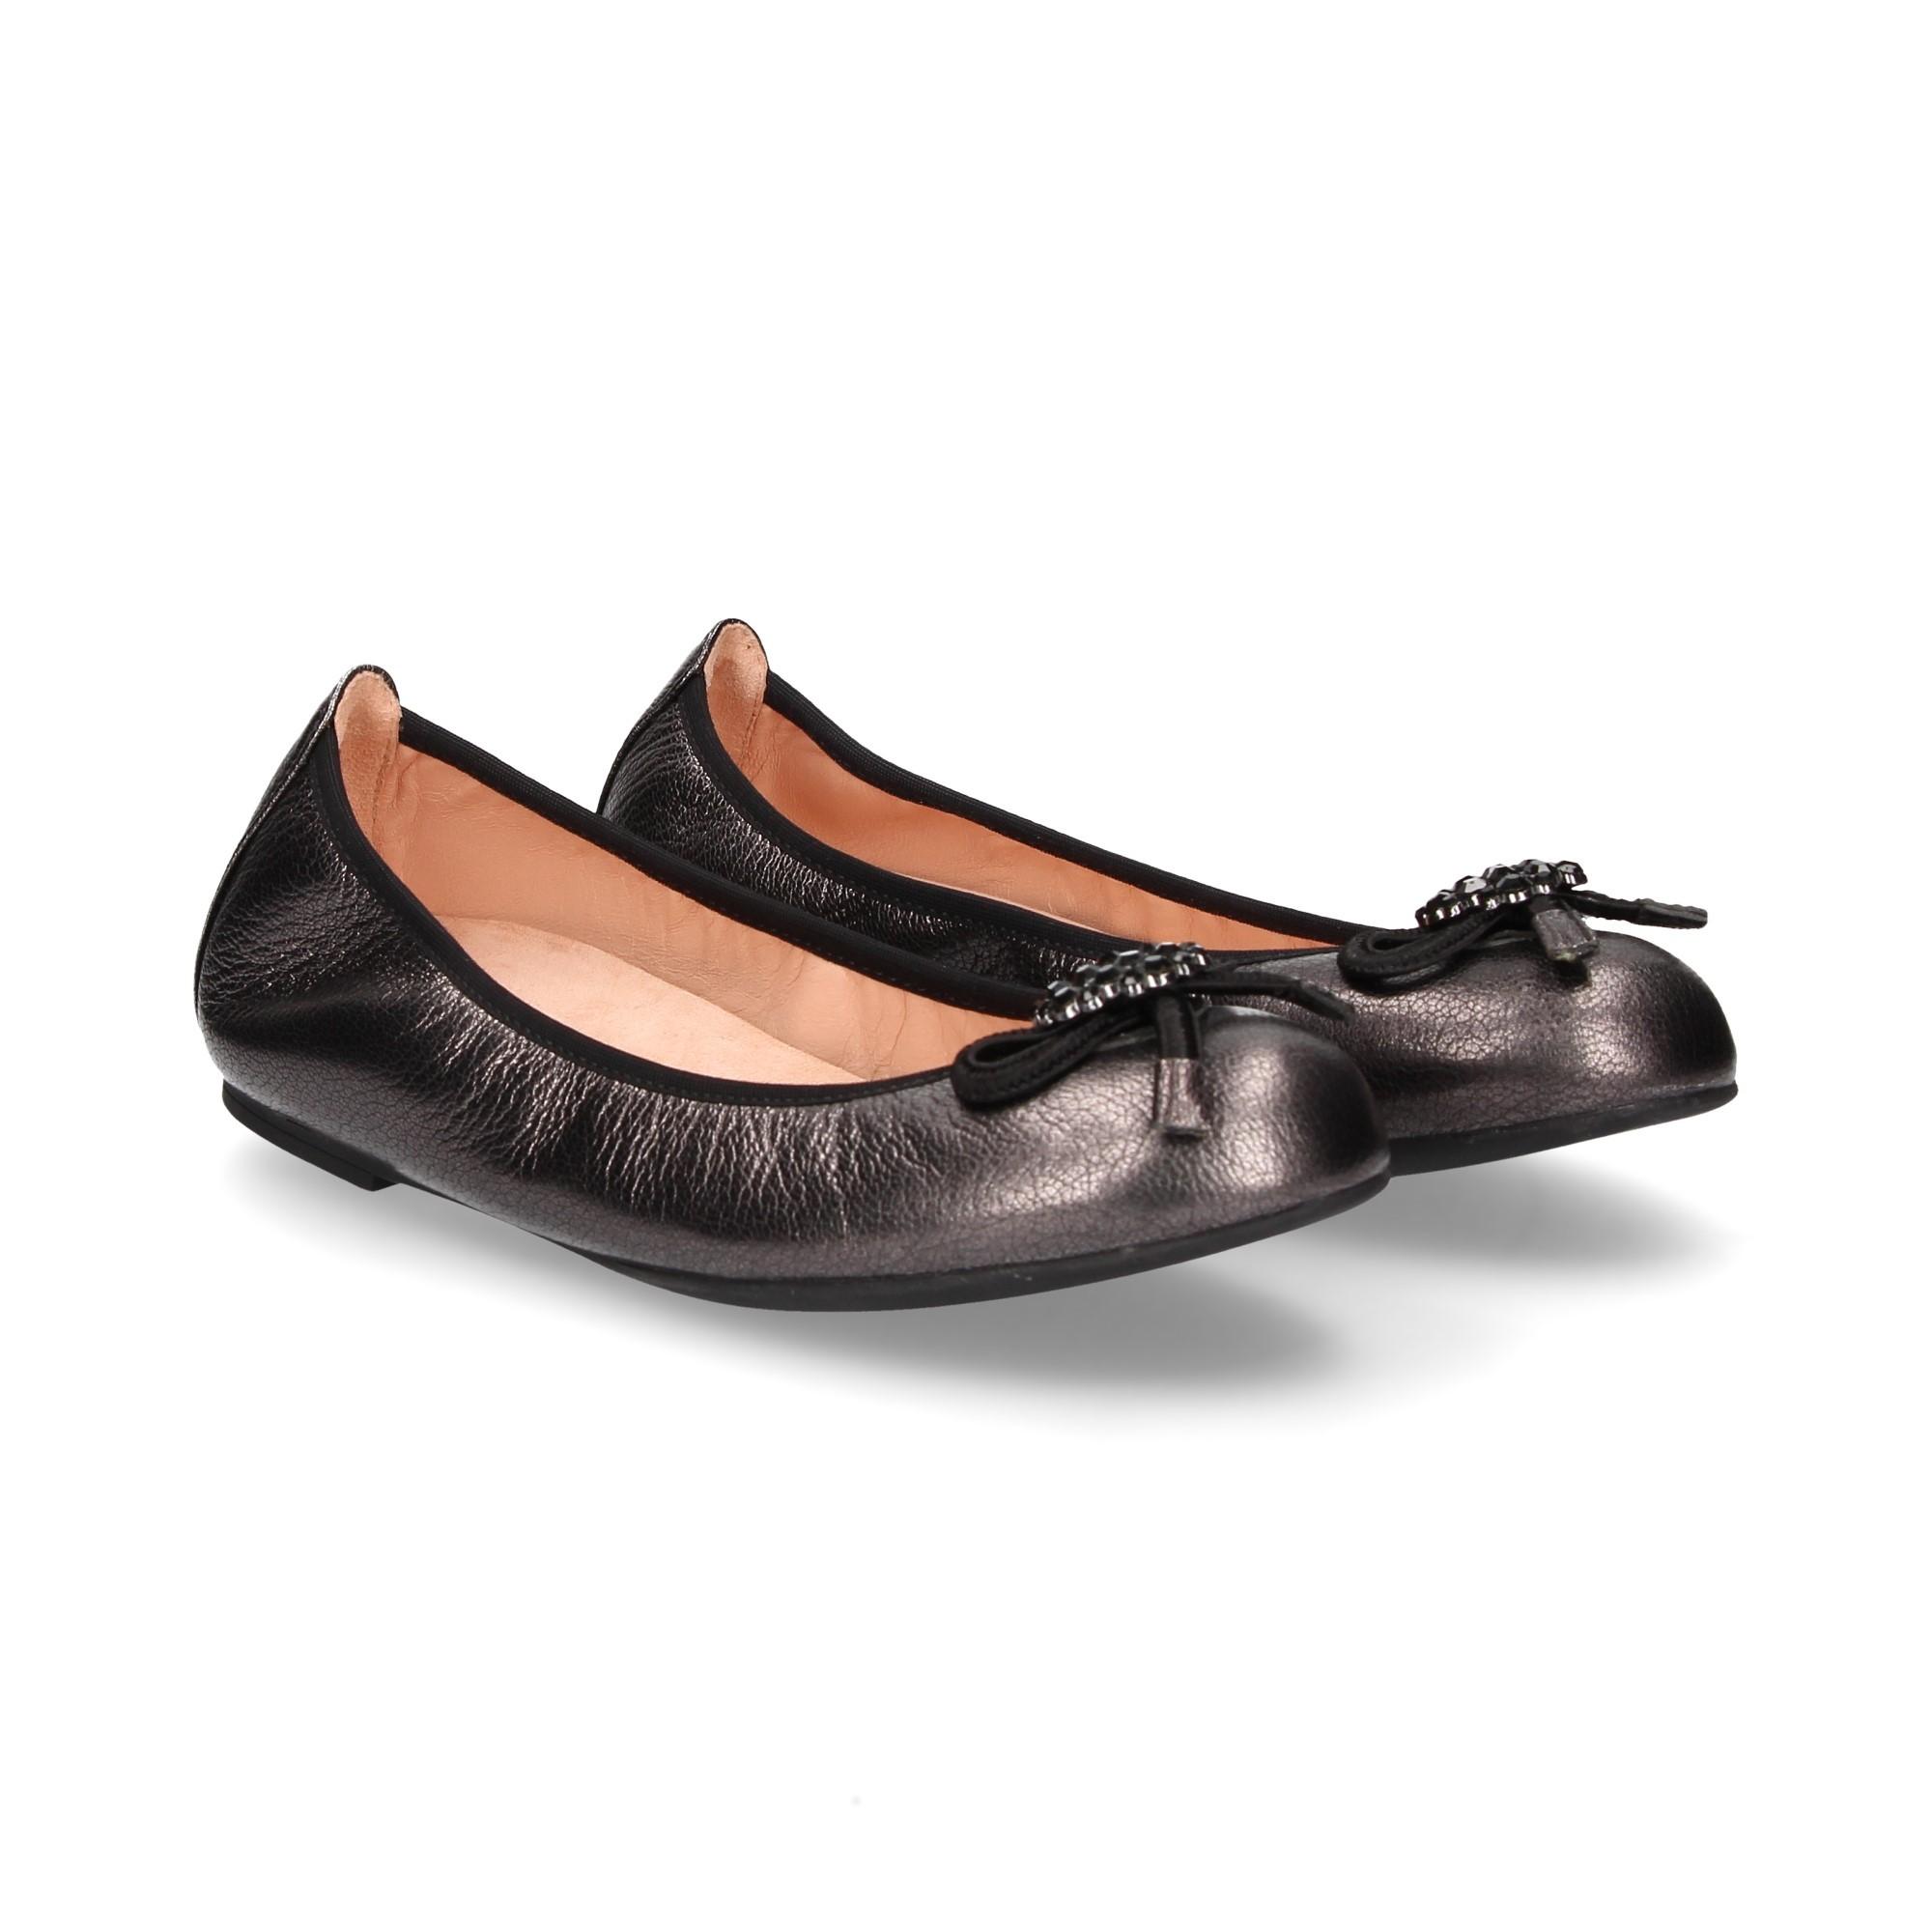 bailarina-lazo-stras-metalizad-black